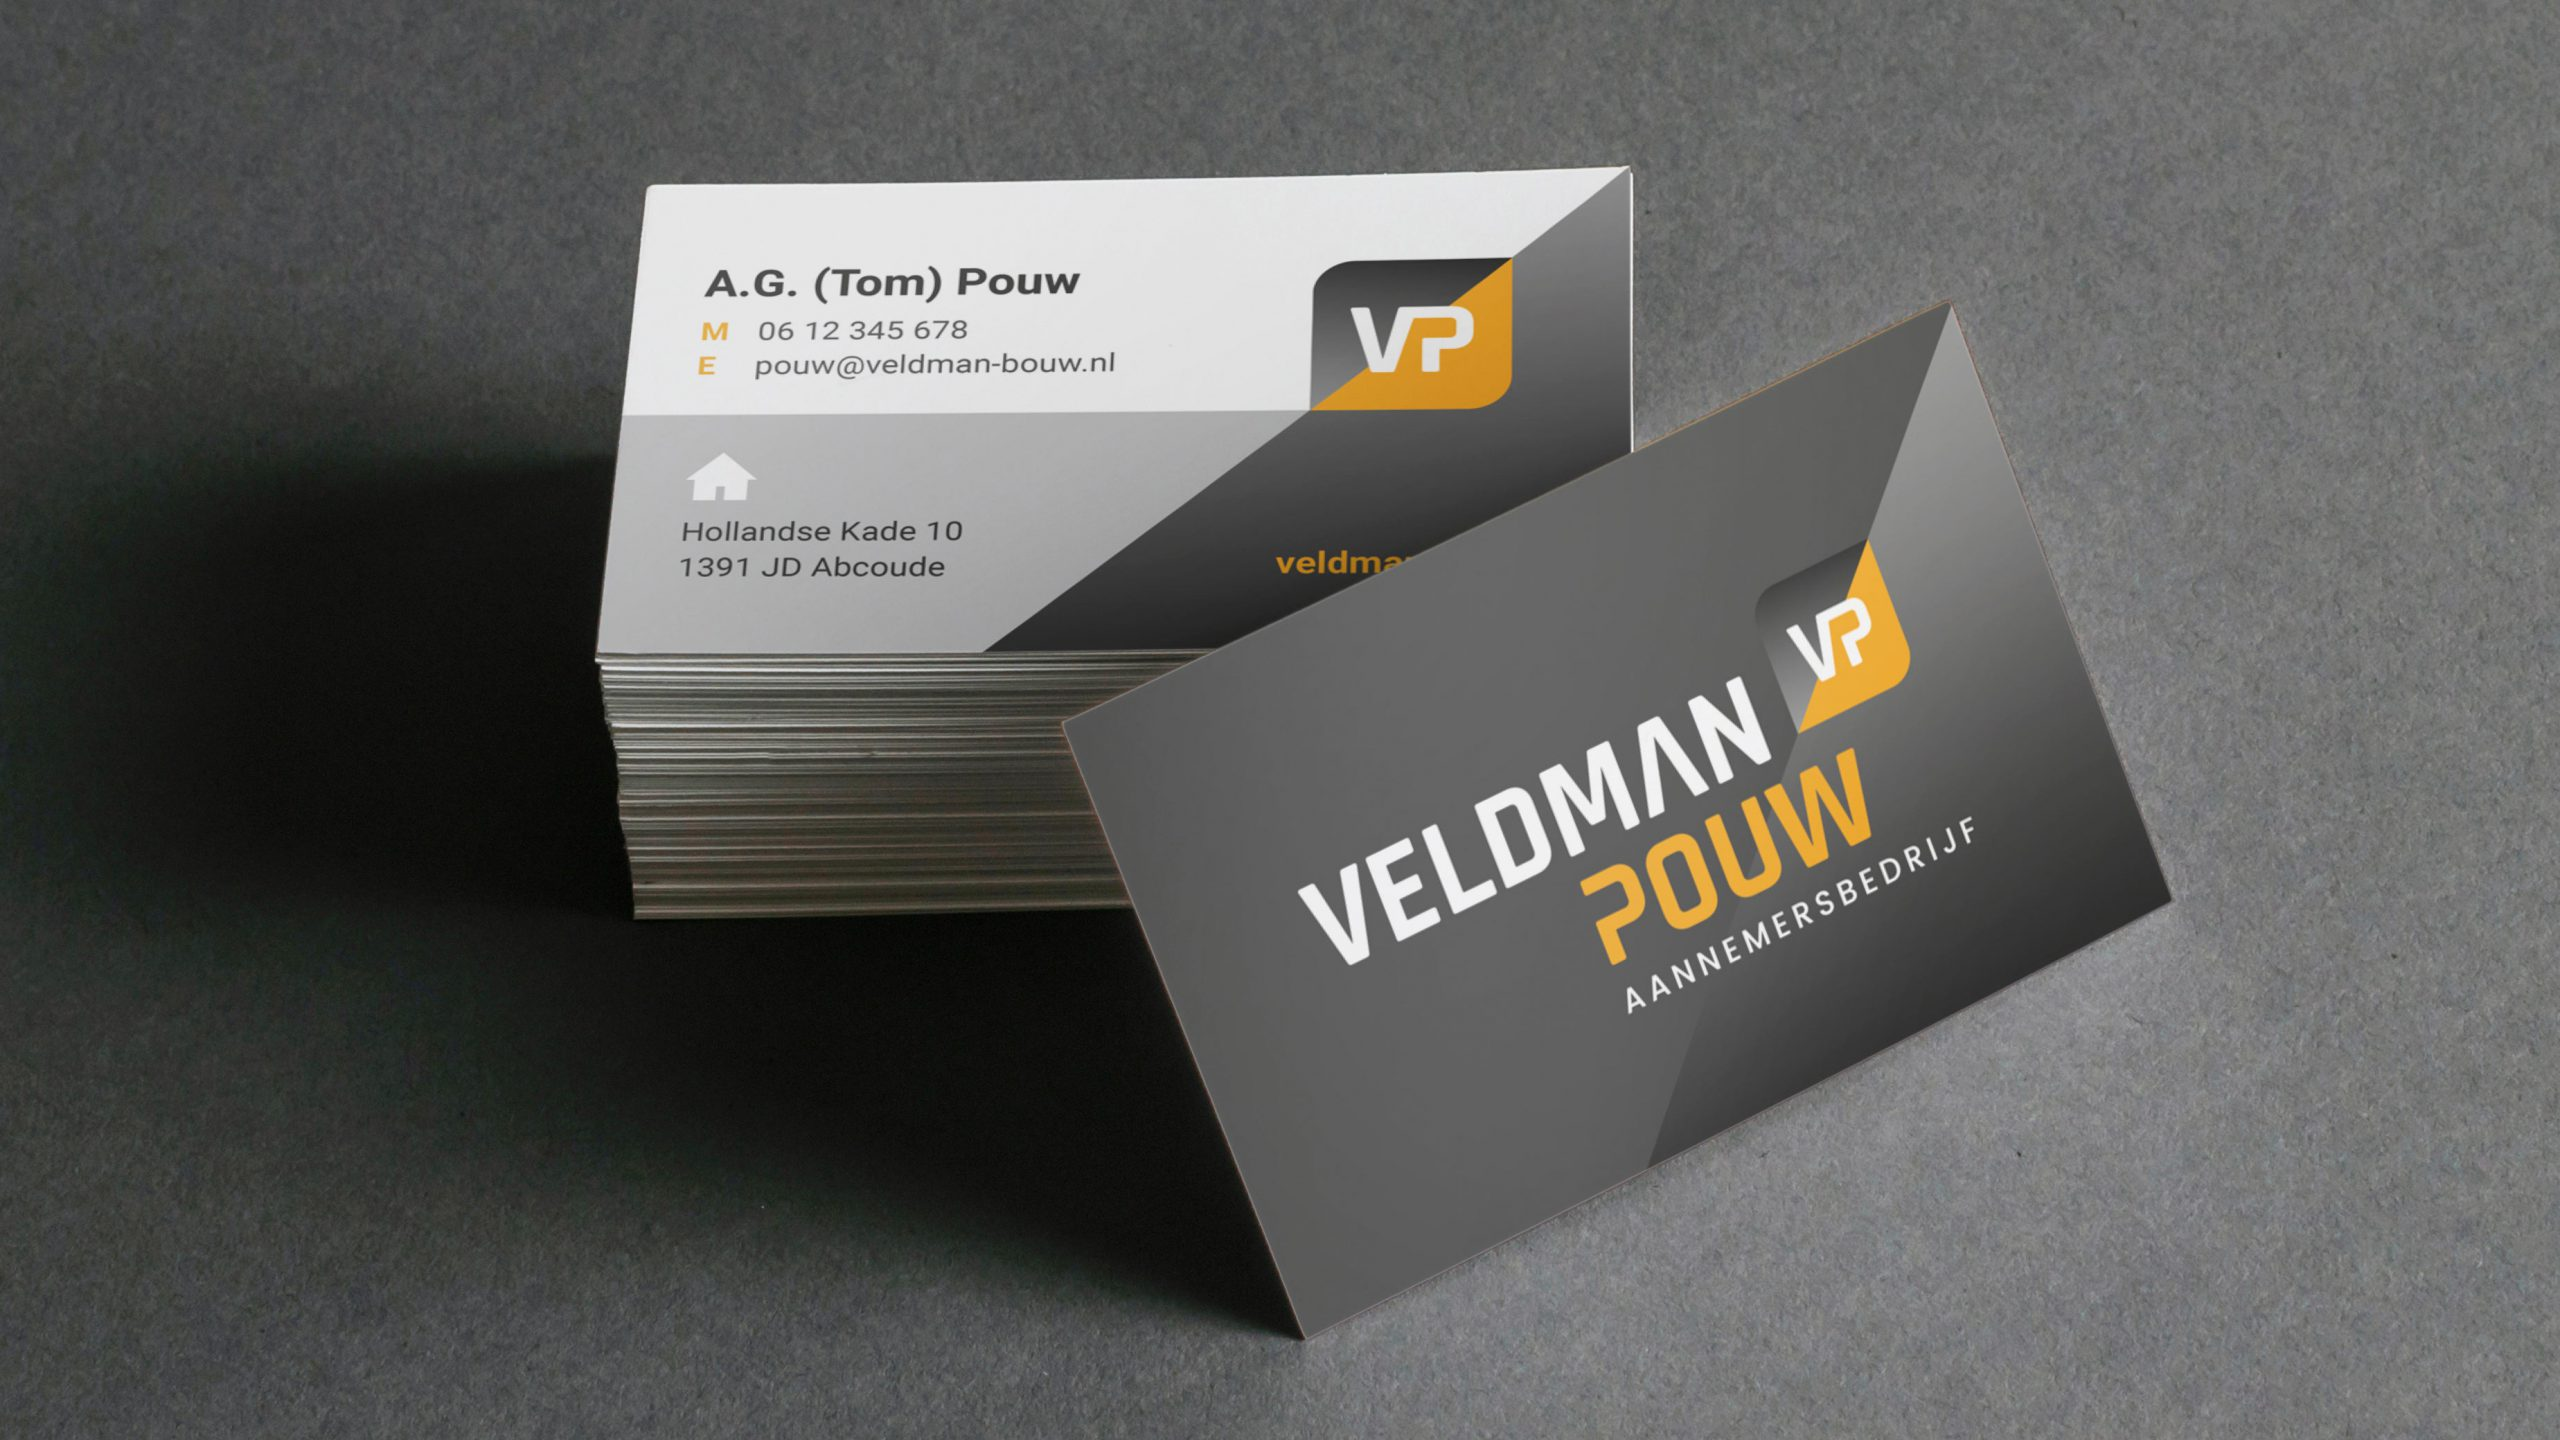 veldmanpouw-visitekaartje